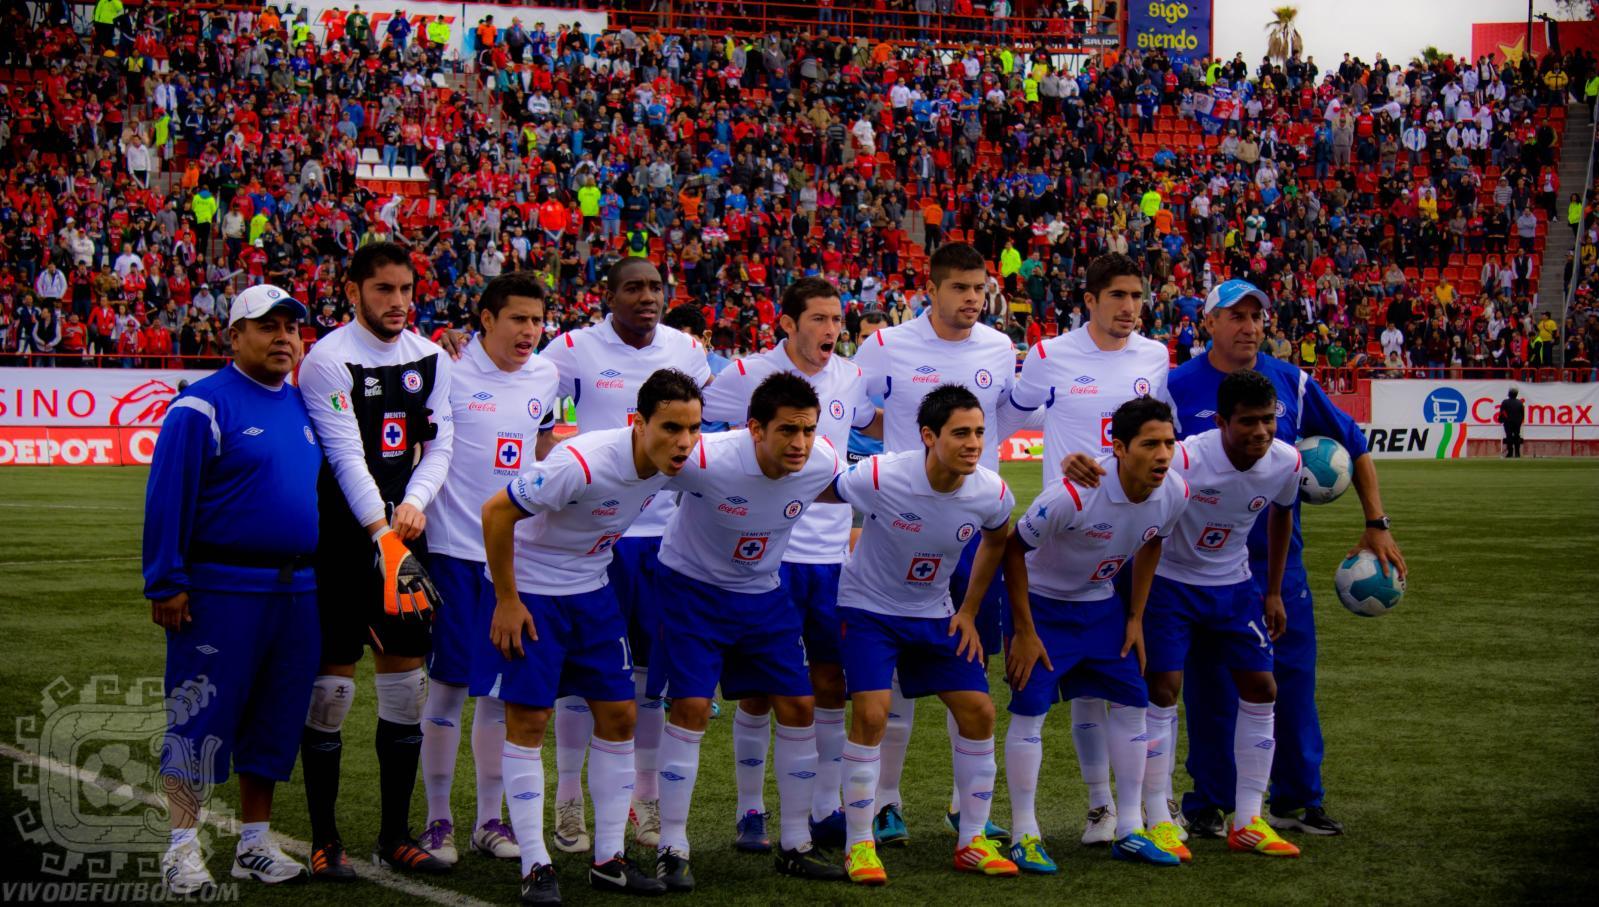 2011–12 Cruz Azul season - Wikipedia